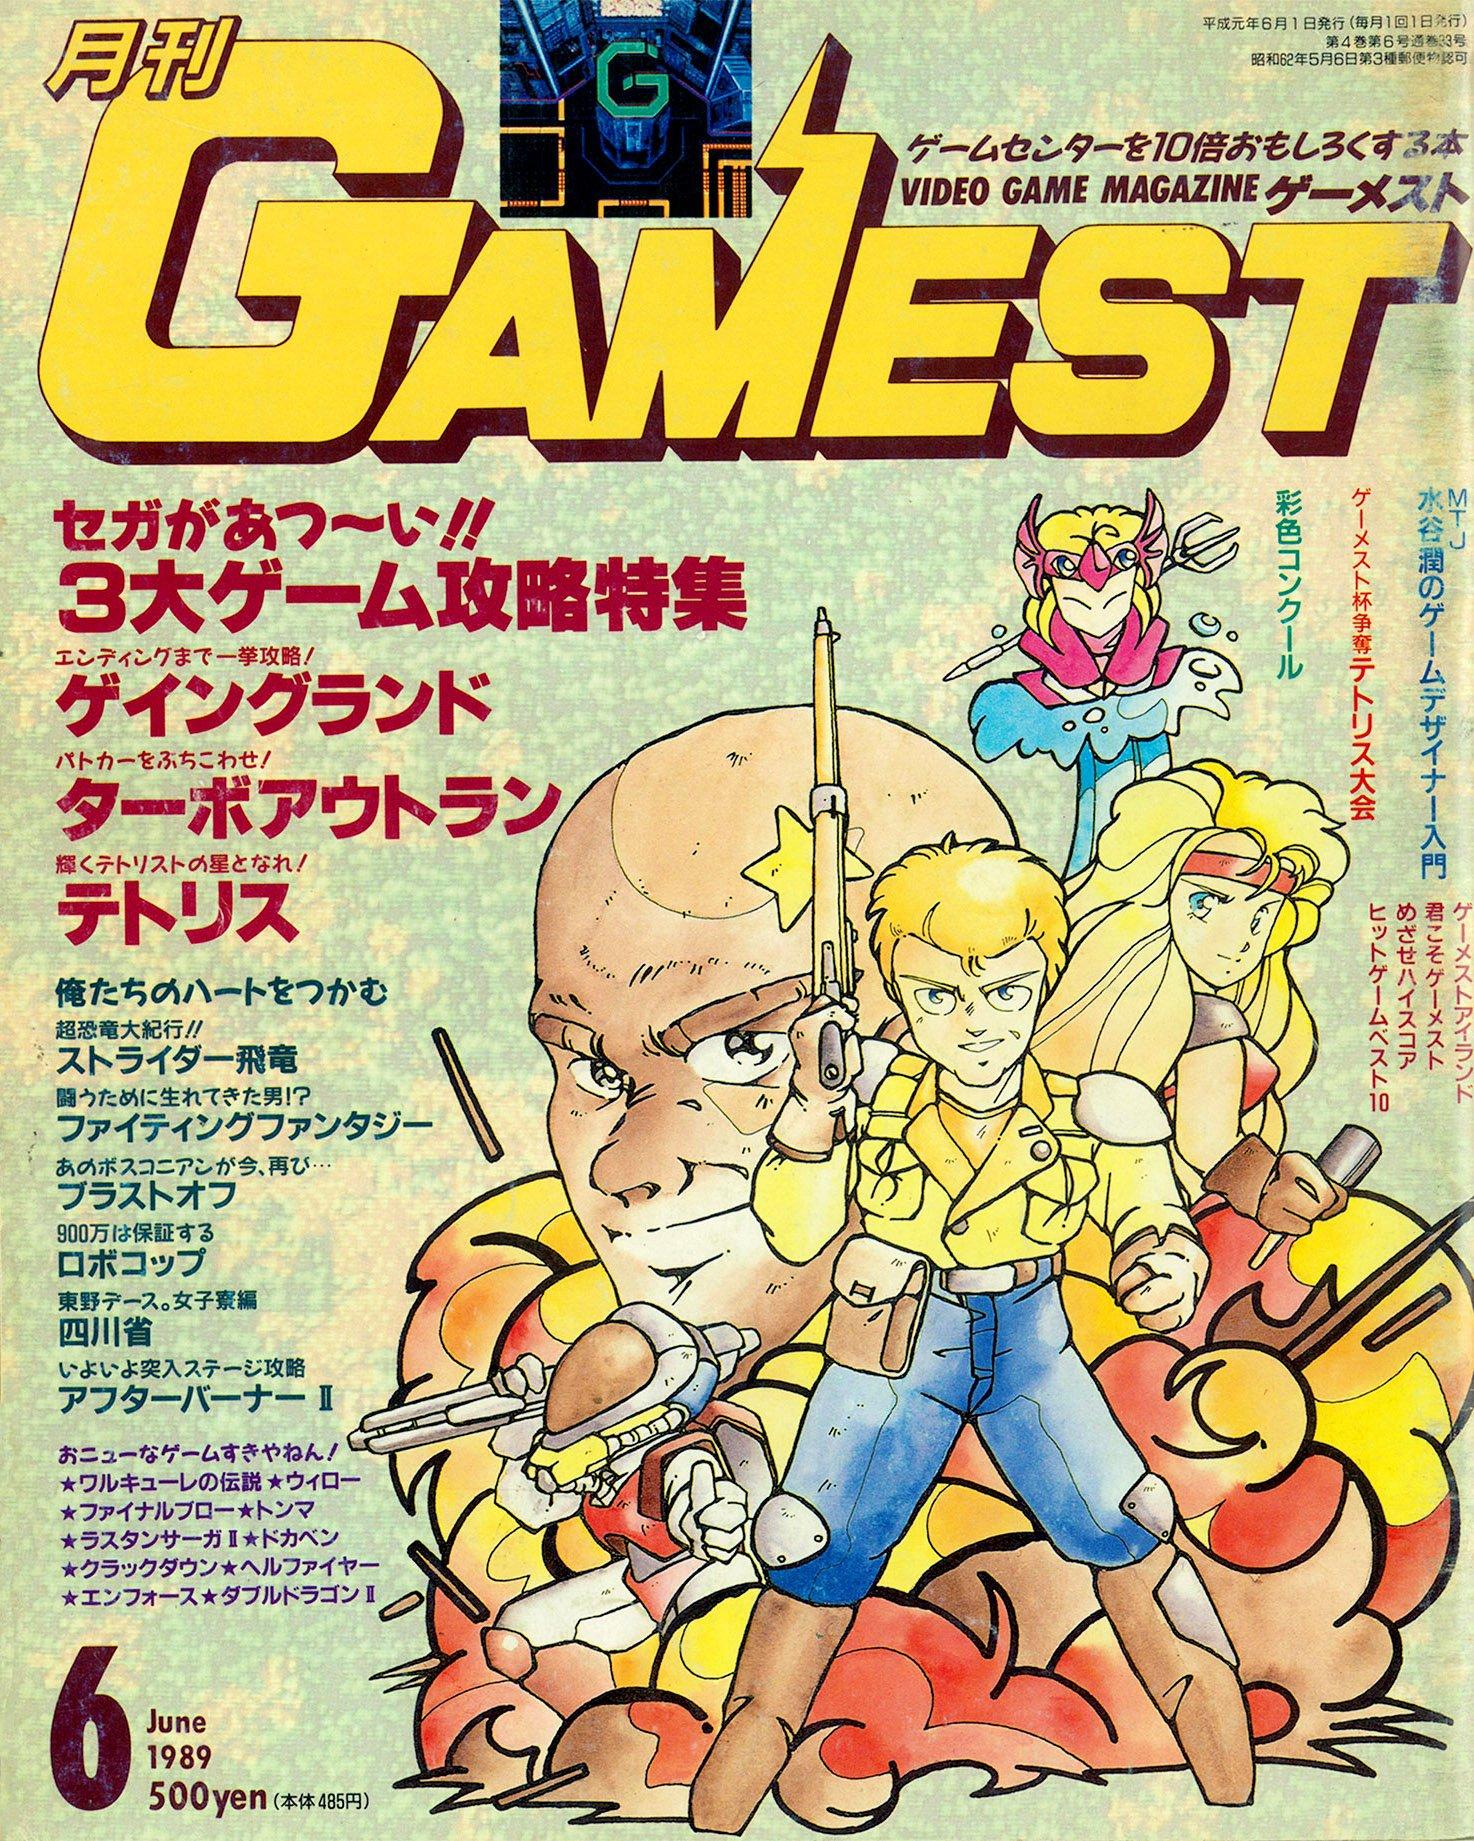 Gamest 033 (June 1989)